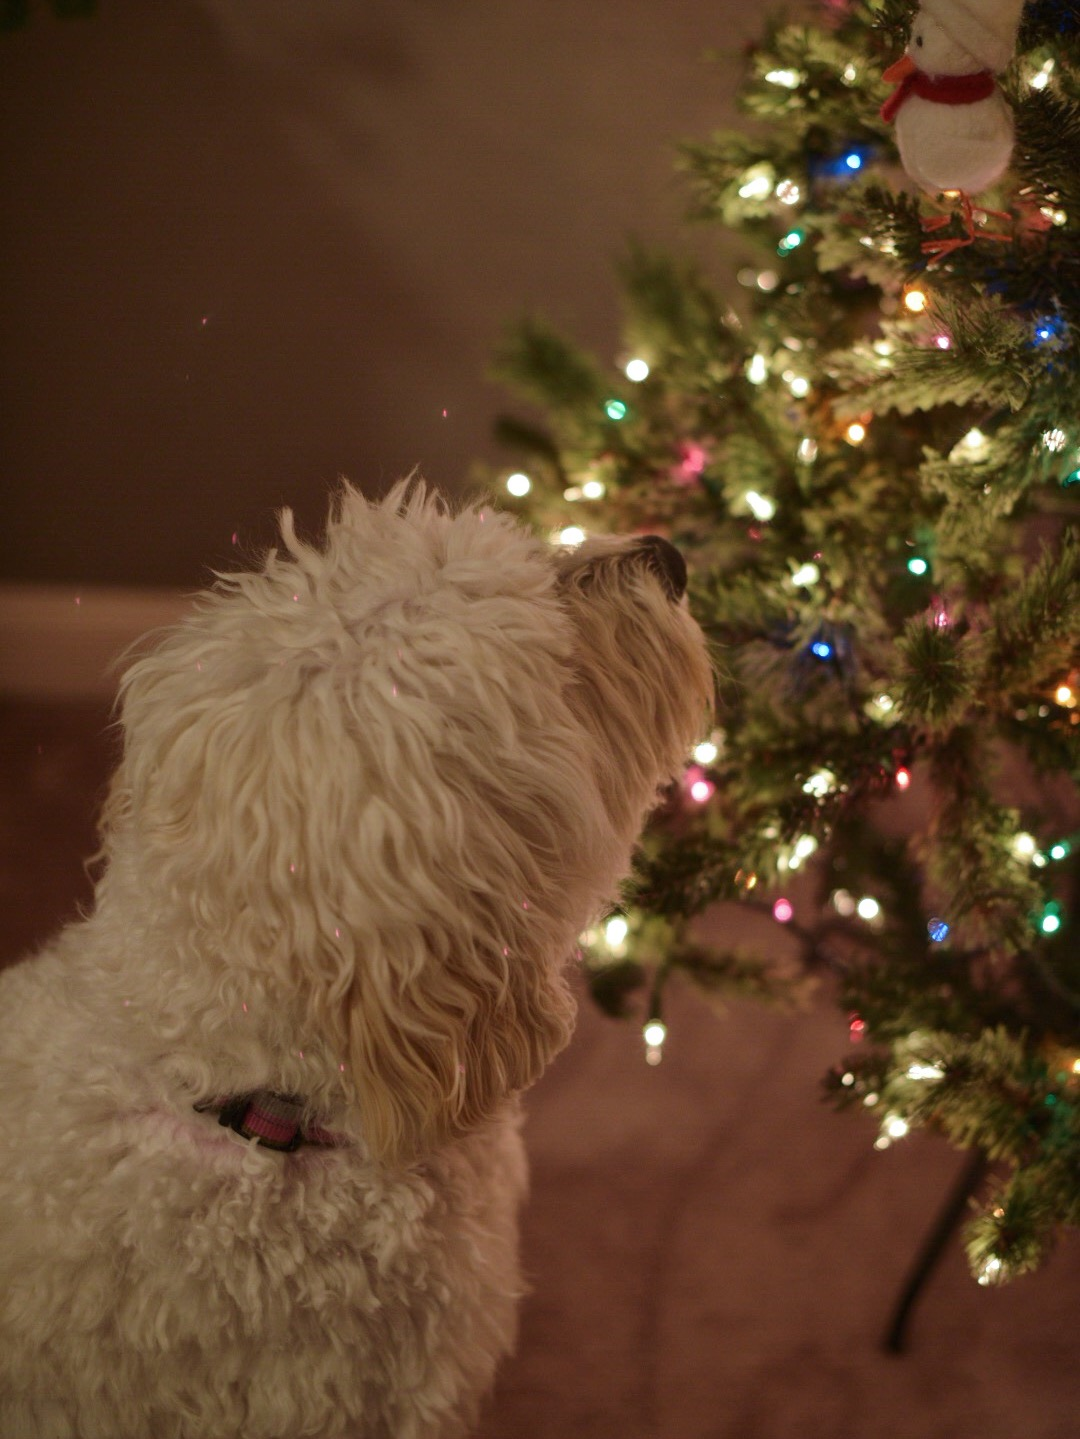 christmas-trees-for-dogs.jpg